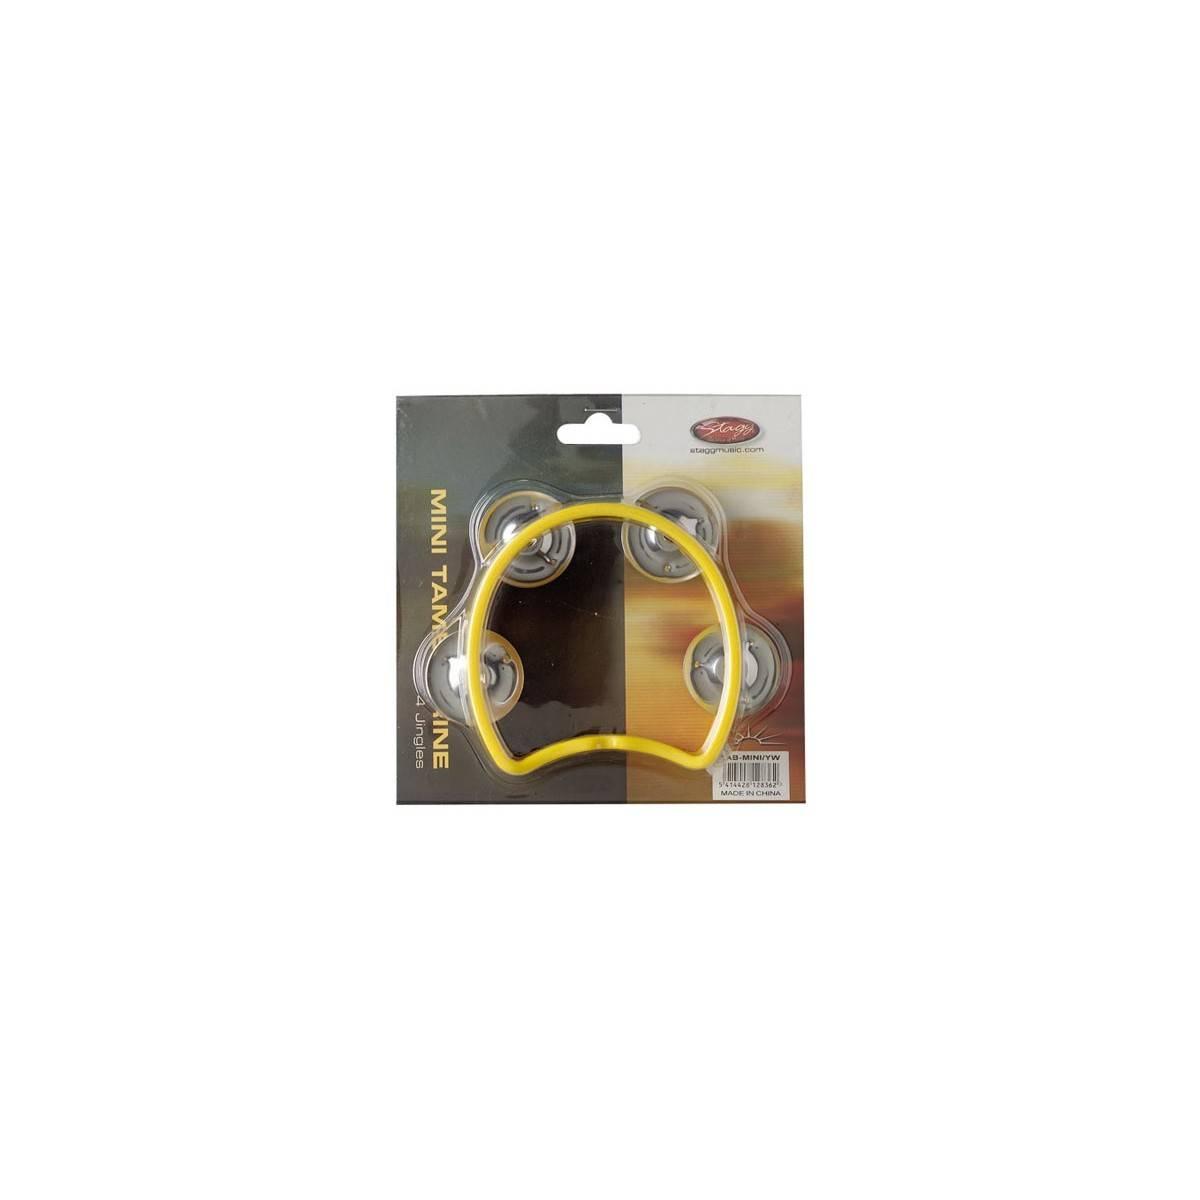 Mini tambourin cymbalettes jaune